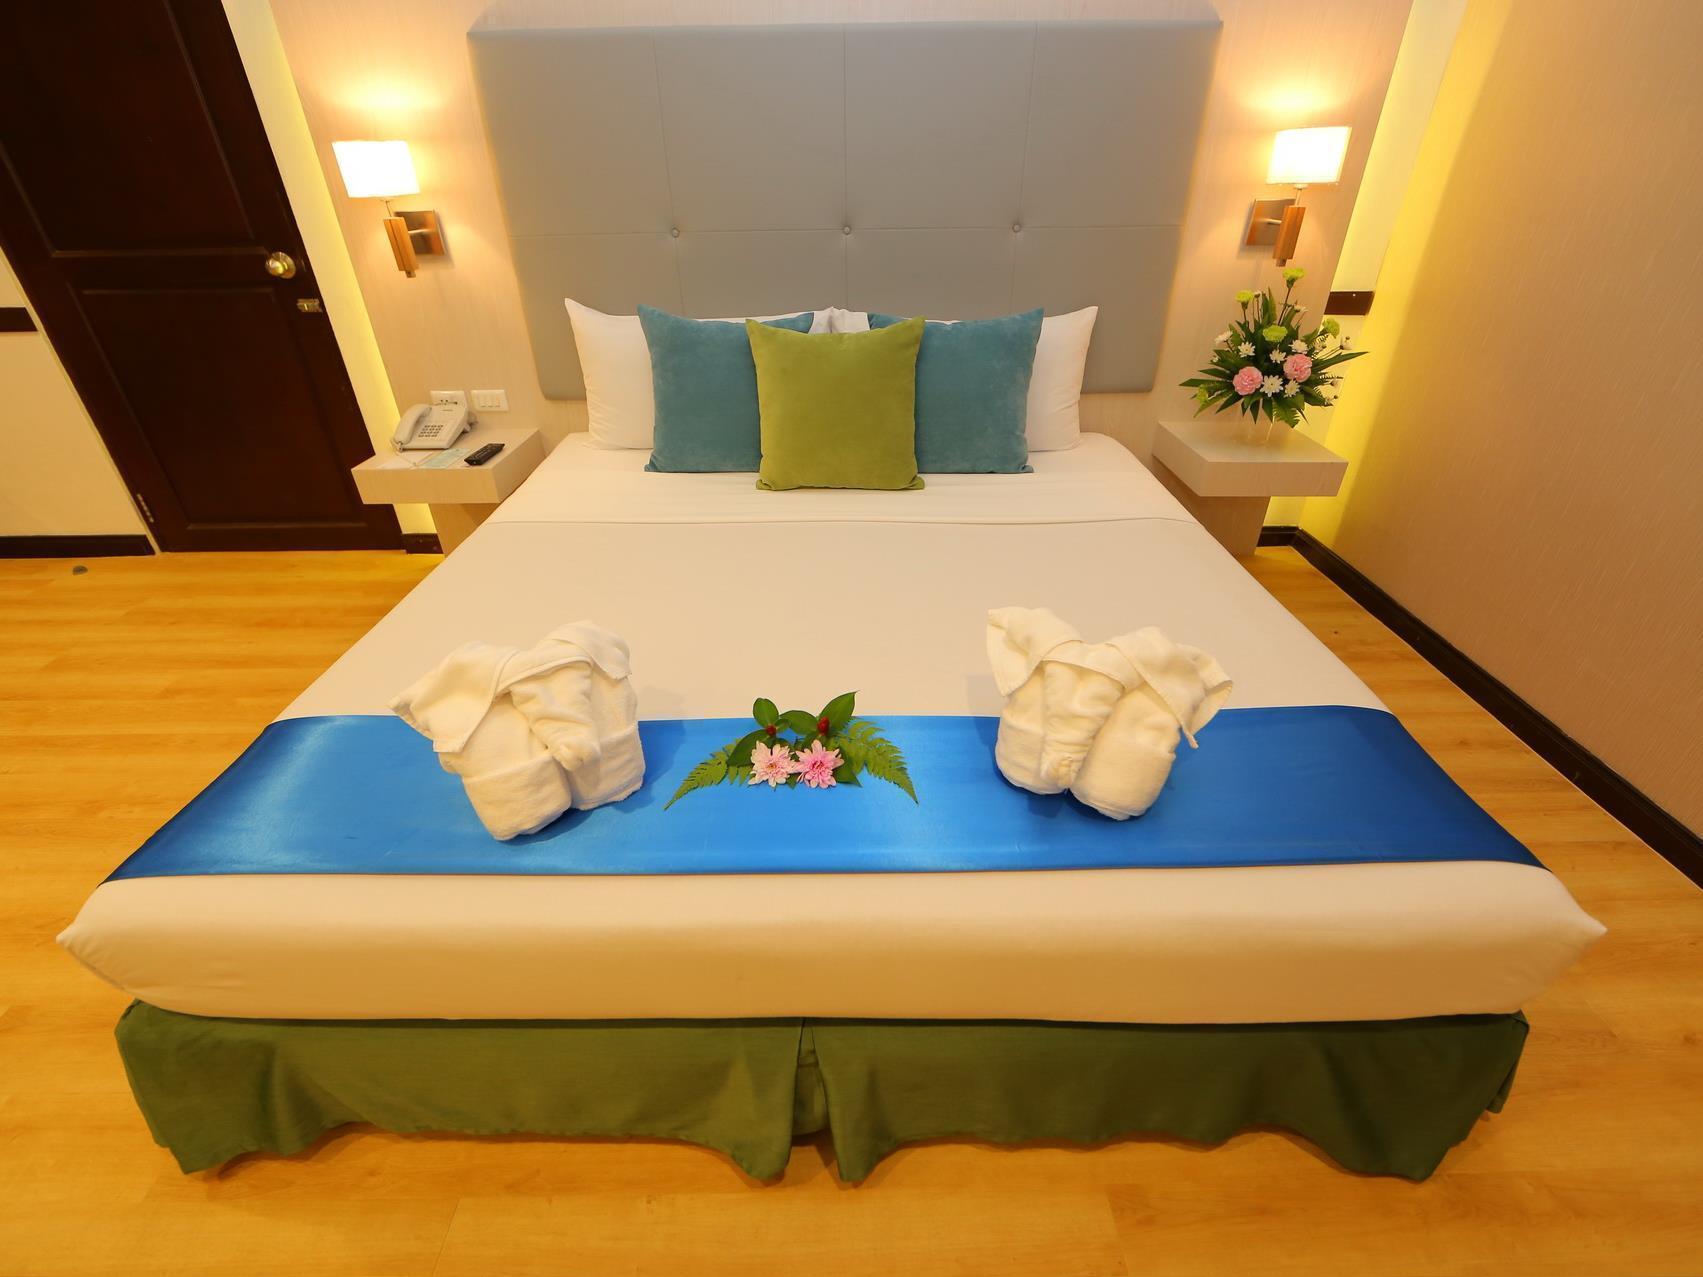 Boat Lagoon Resort โบ๊ทลากูน รีสอร์ท